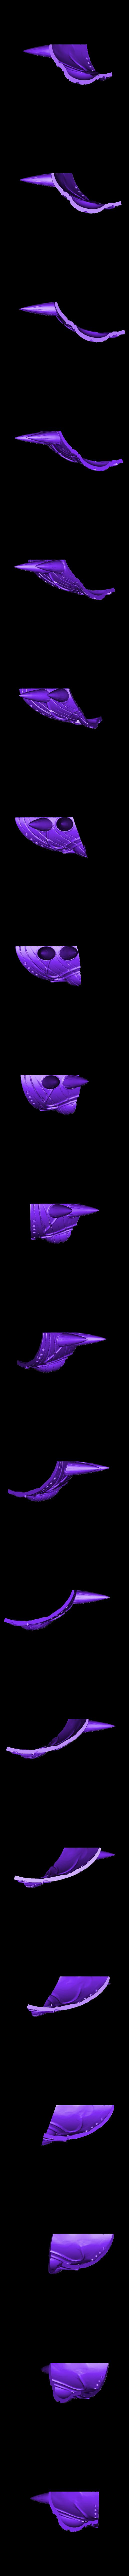 AI3M_L-bottom.stl Download free STL file Wall Mount for Majora's Mask (full size) • 3D printer model, 3DPrintDogs